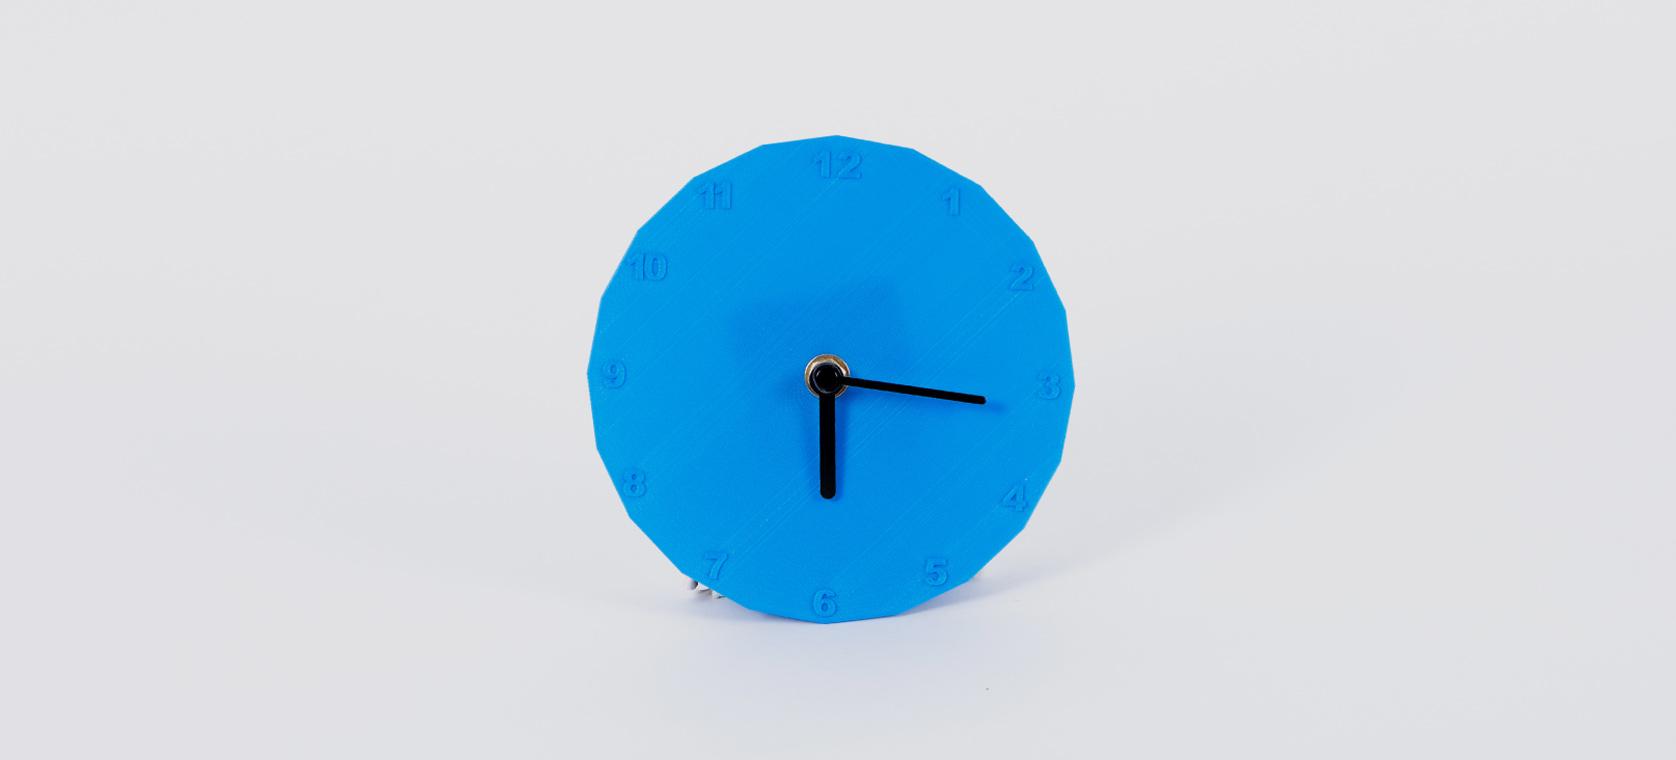 Battery Powered Clocks